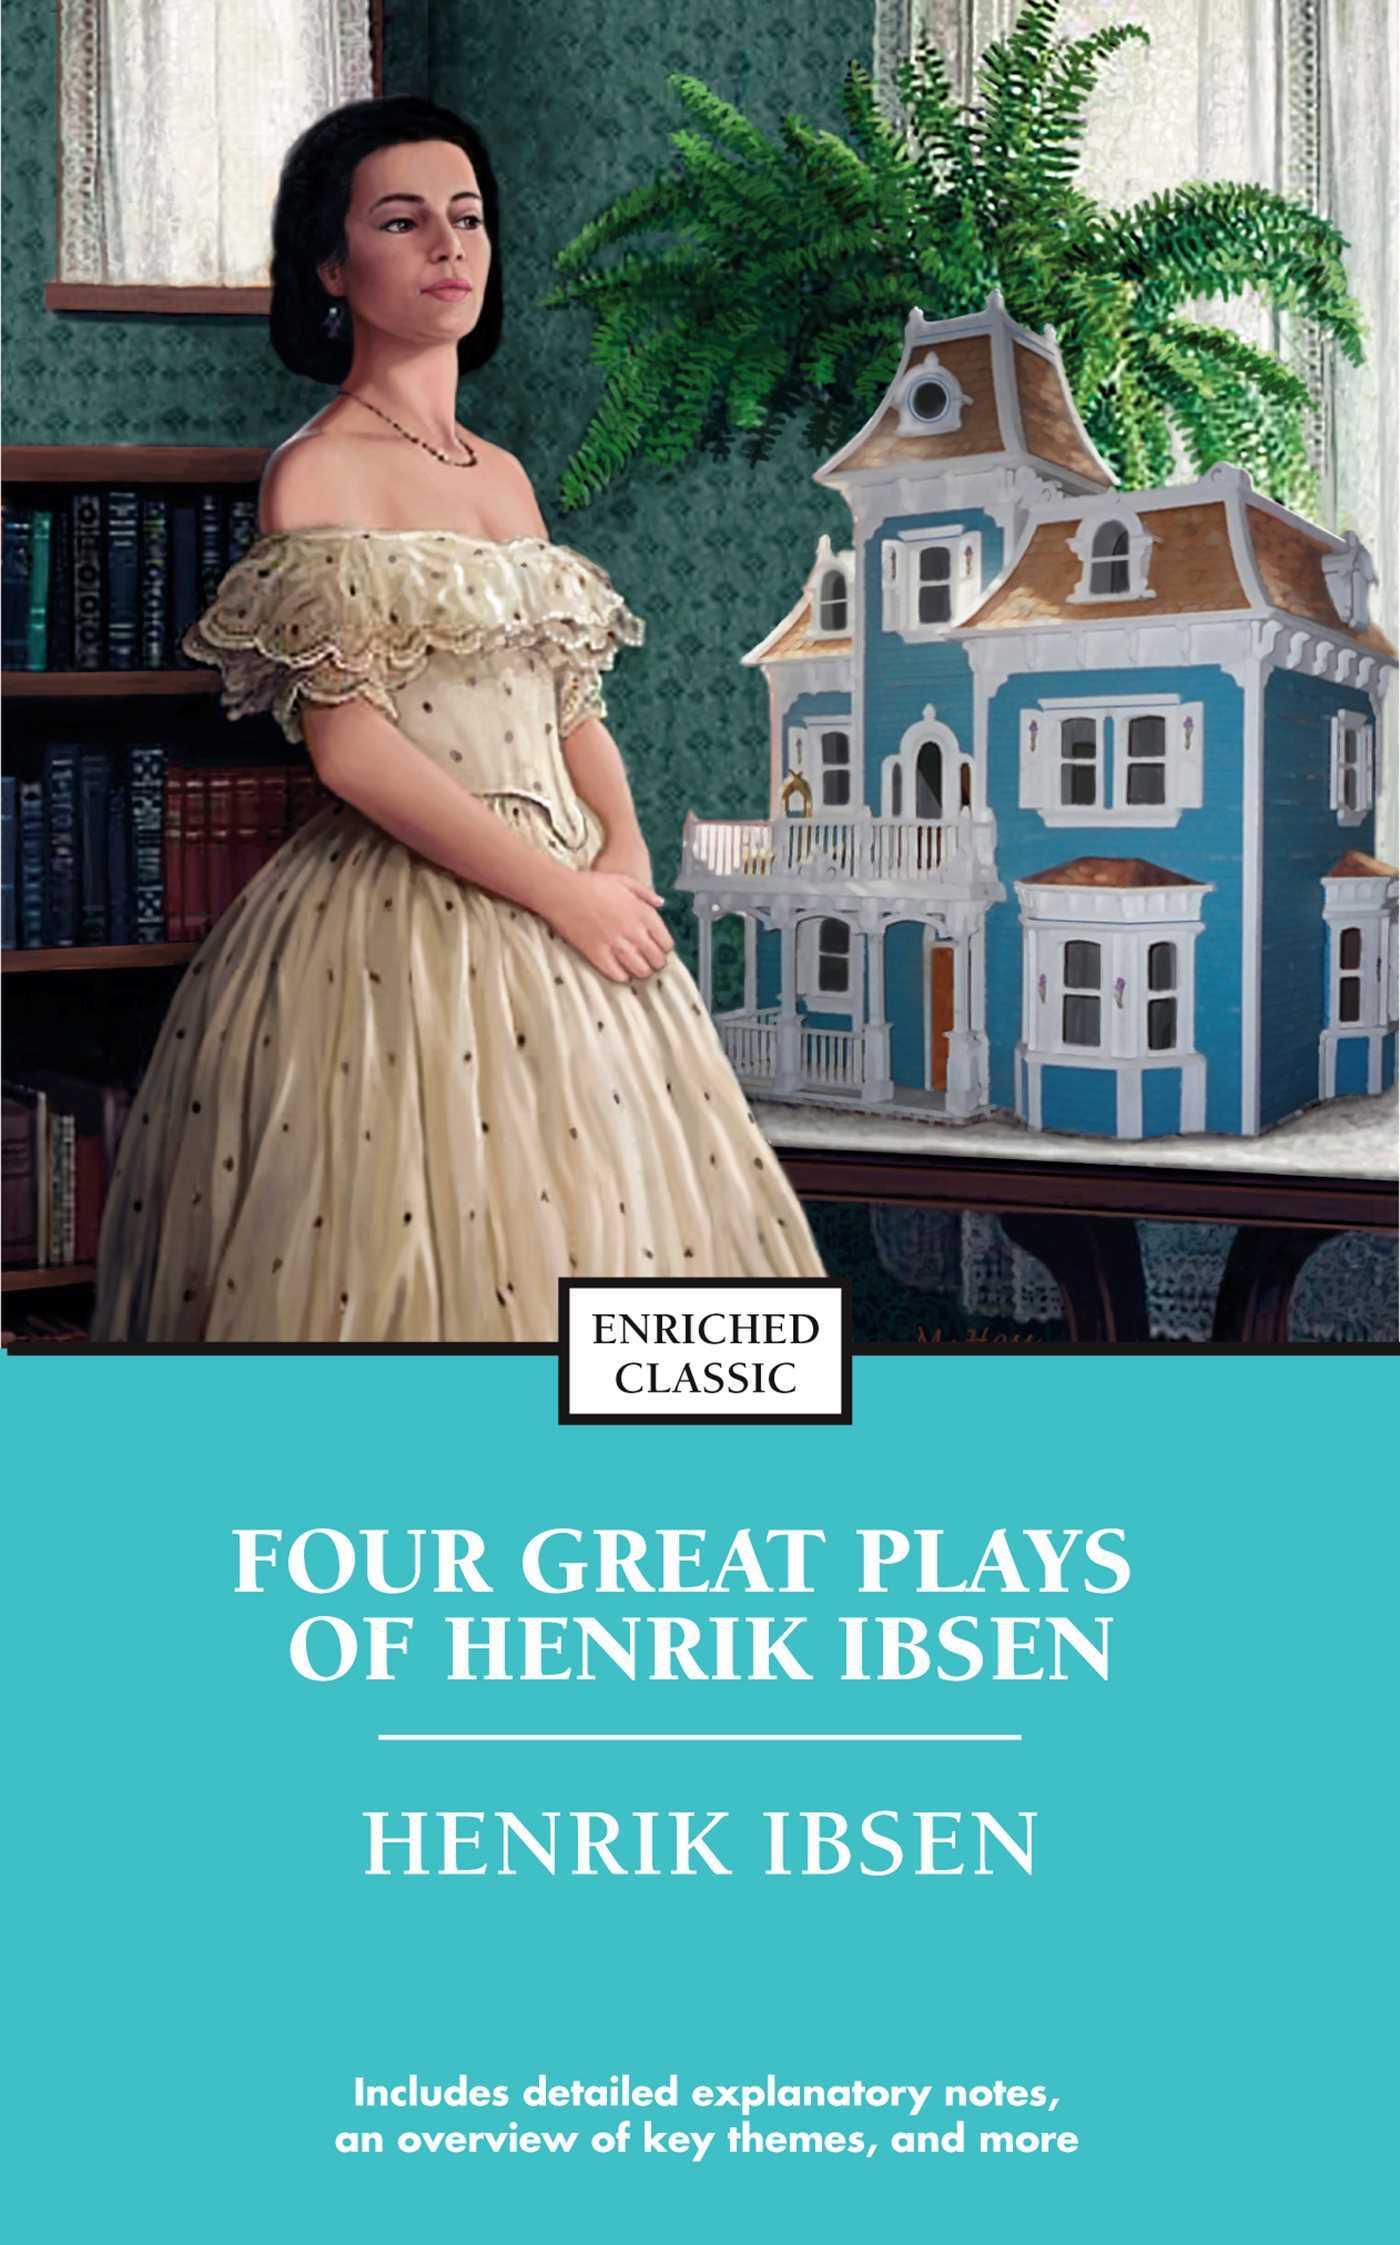 Four Great Plays of Henrik Ibsen: A Dolls House, The Wild Duck, Hedda Gabler, The M Henrick Ibsen